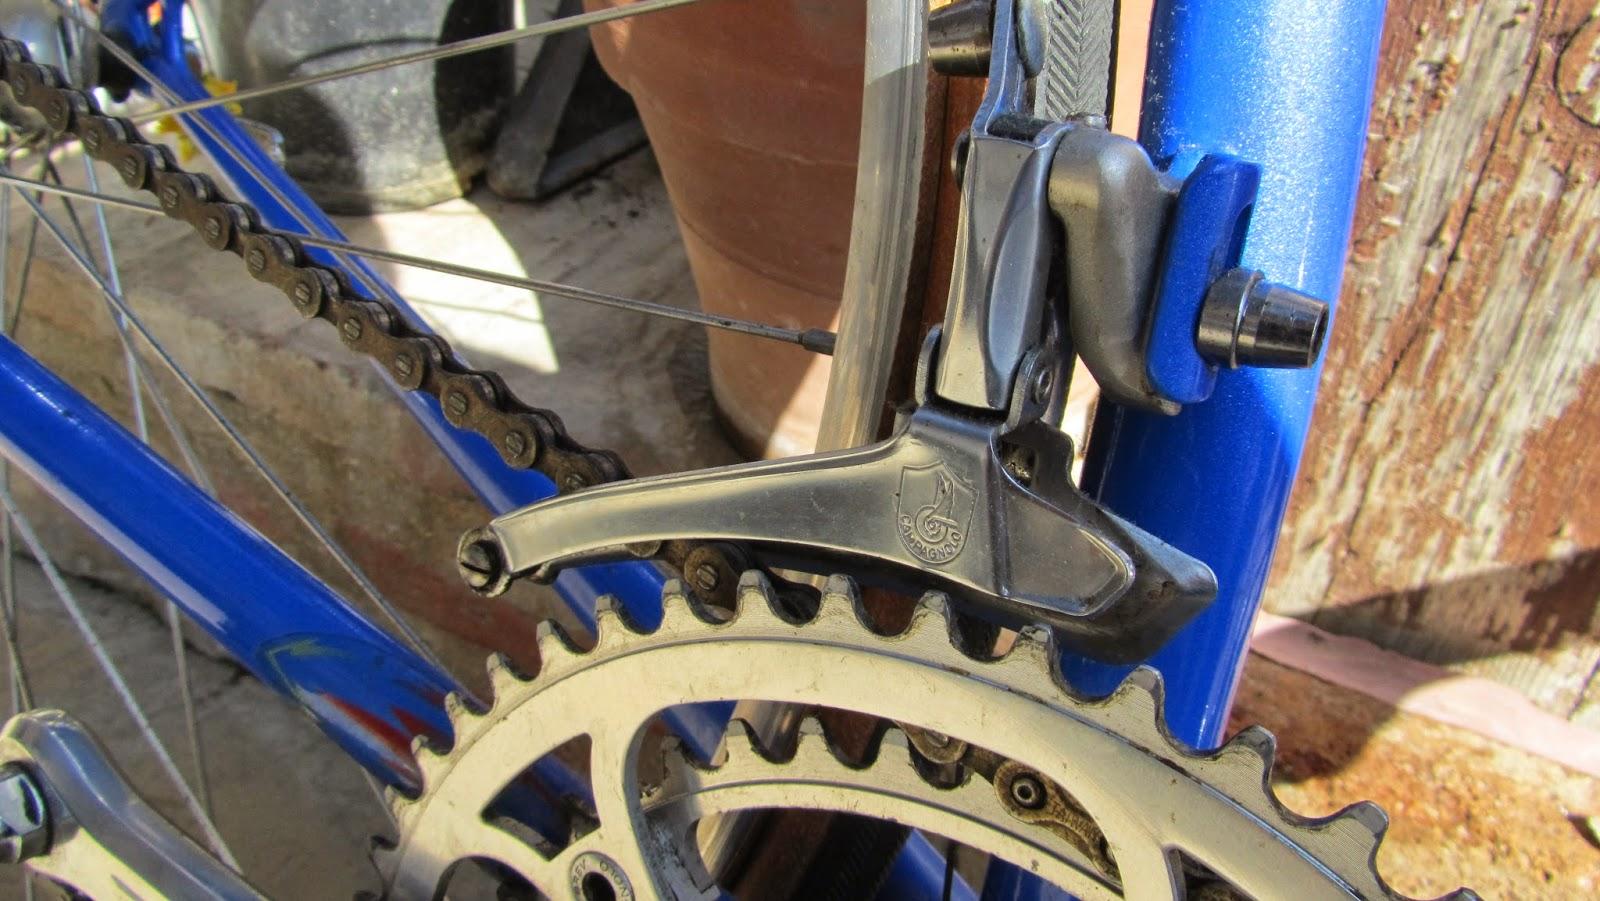 bicicleta orbea contrarreloj desviador campagnolo